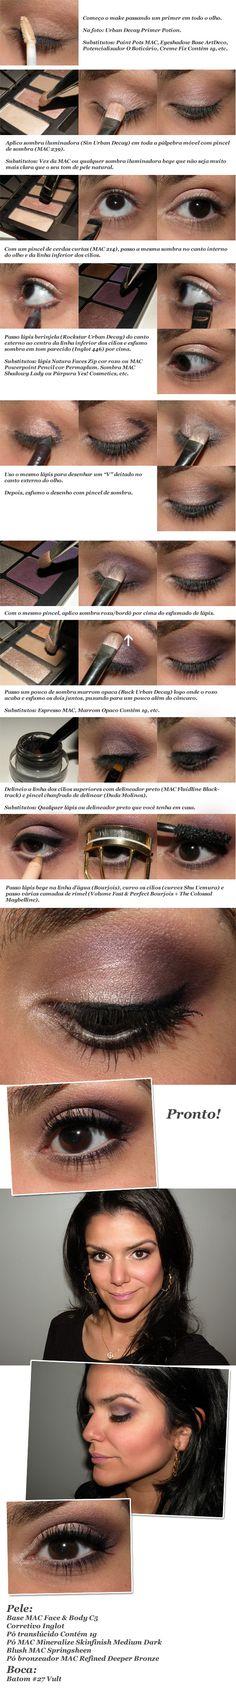 UD Naked Palette with purple eyeshadow tutorial